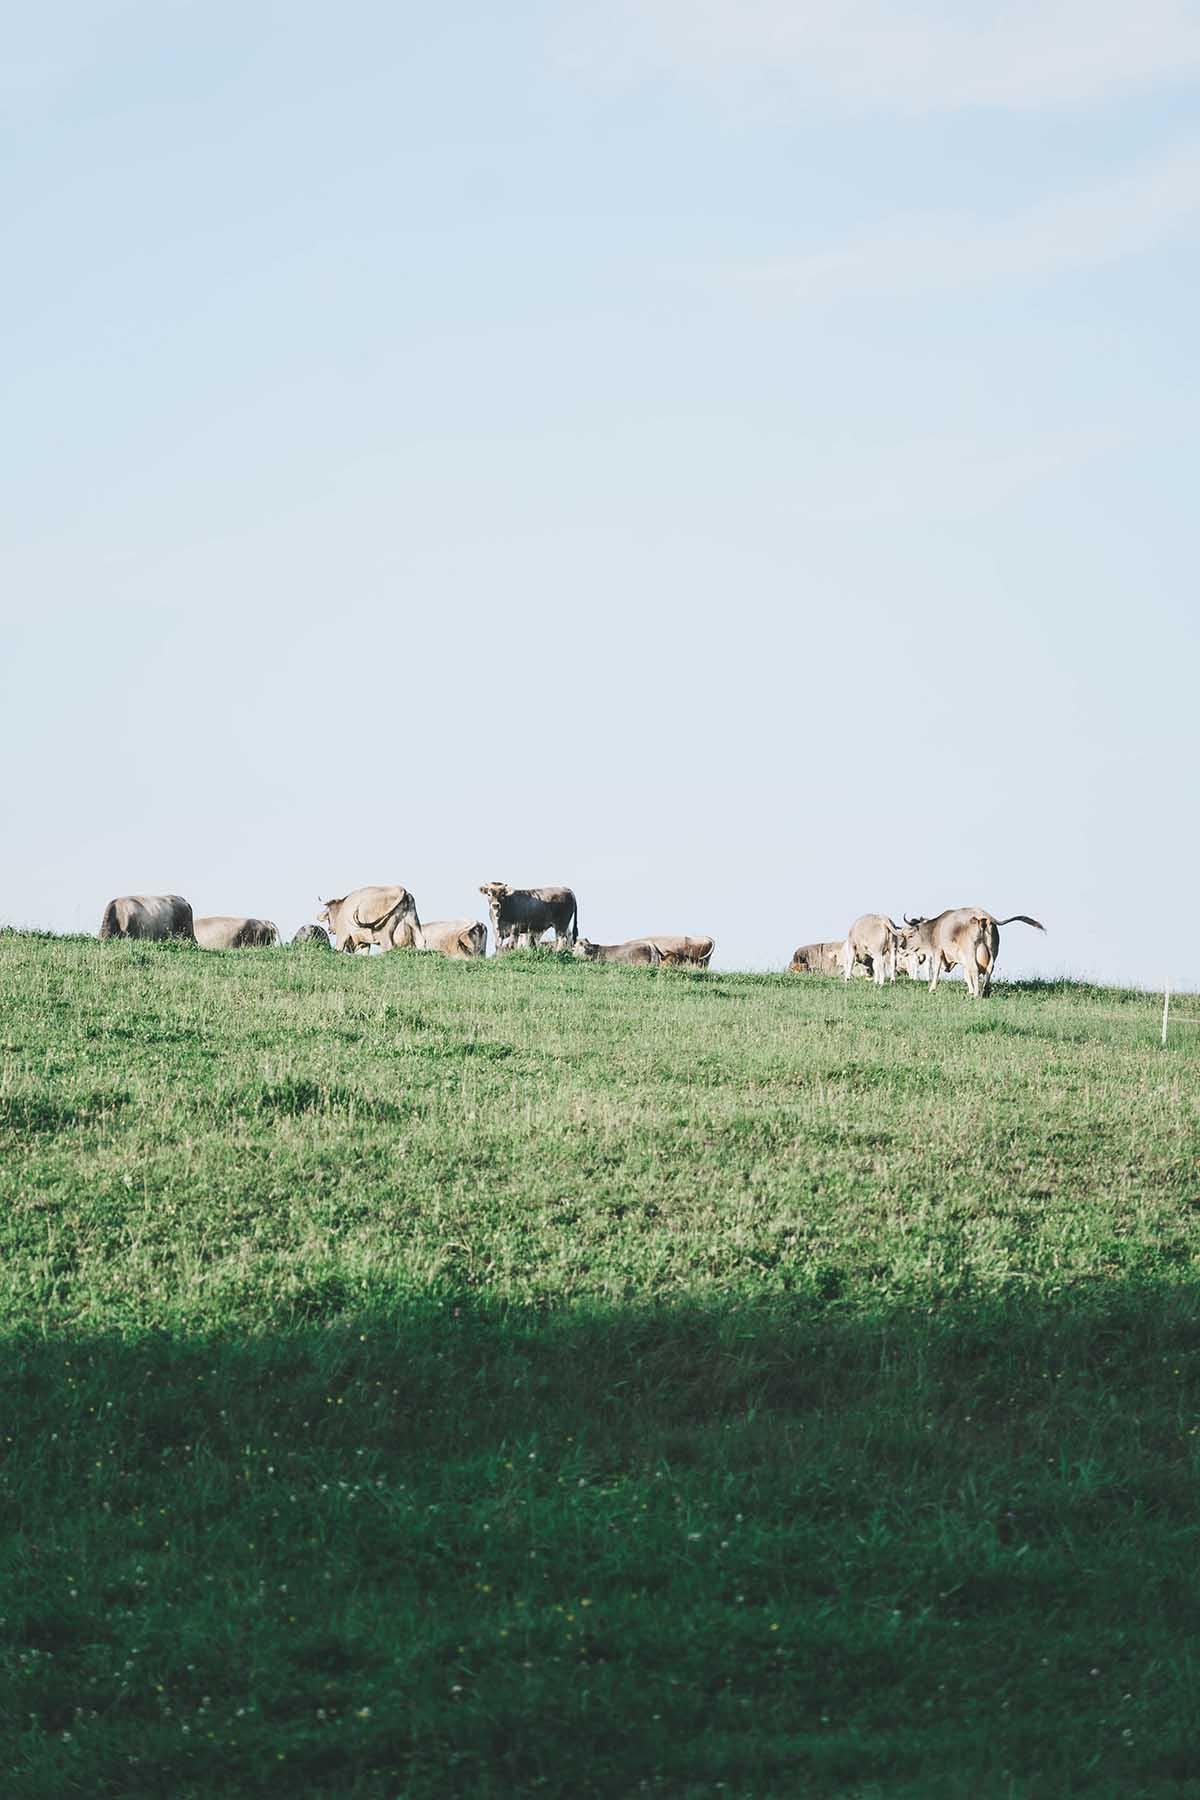 wandern-donausteig-schloegener-schlinge-kuehe